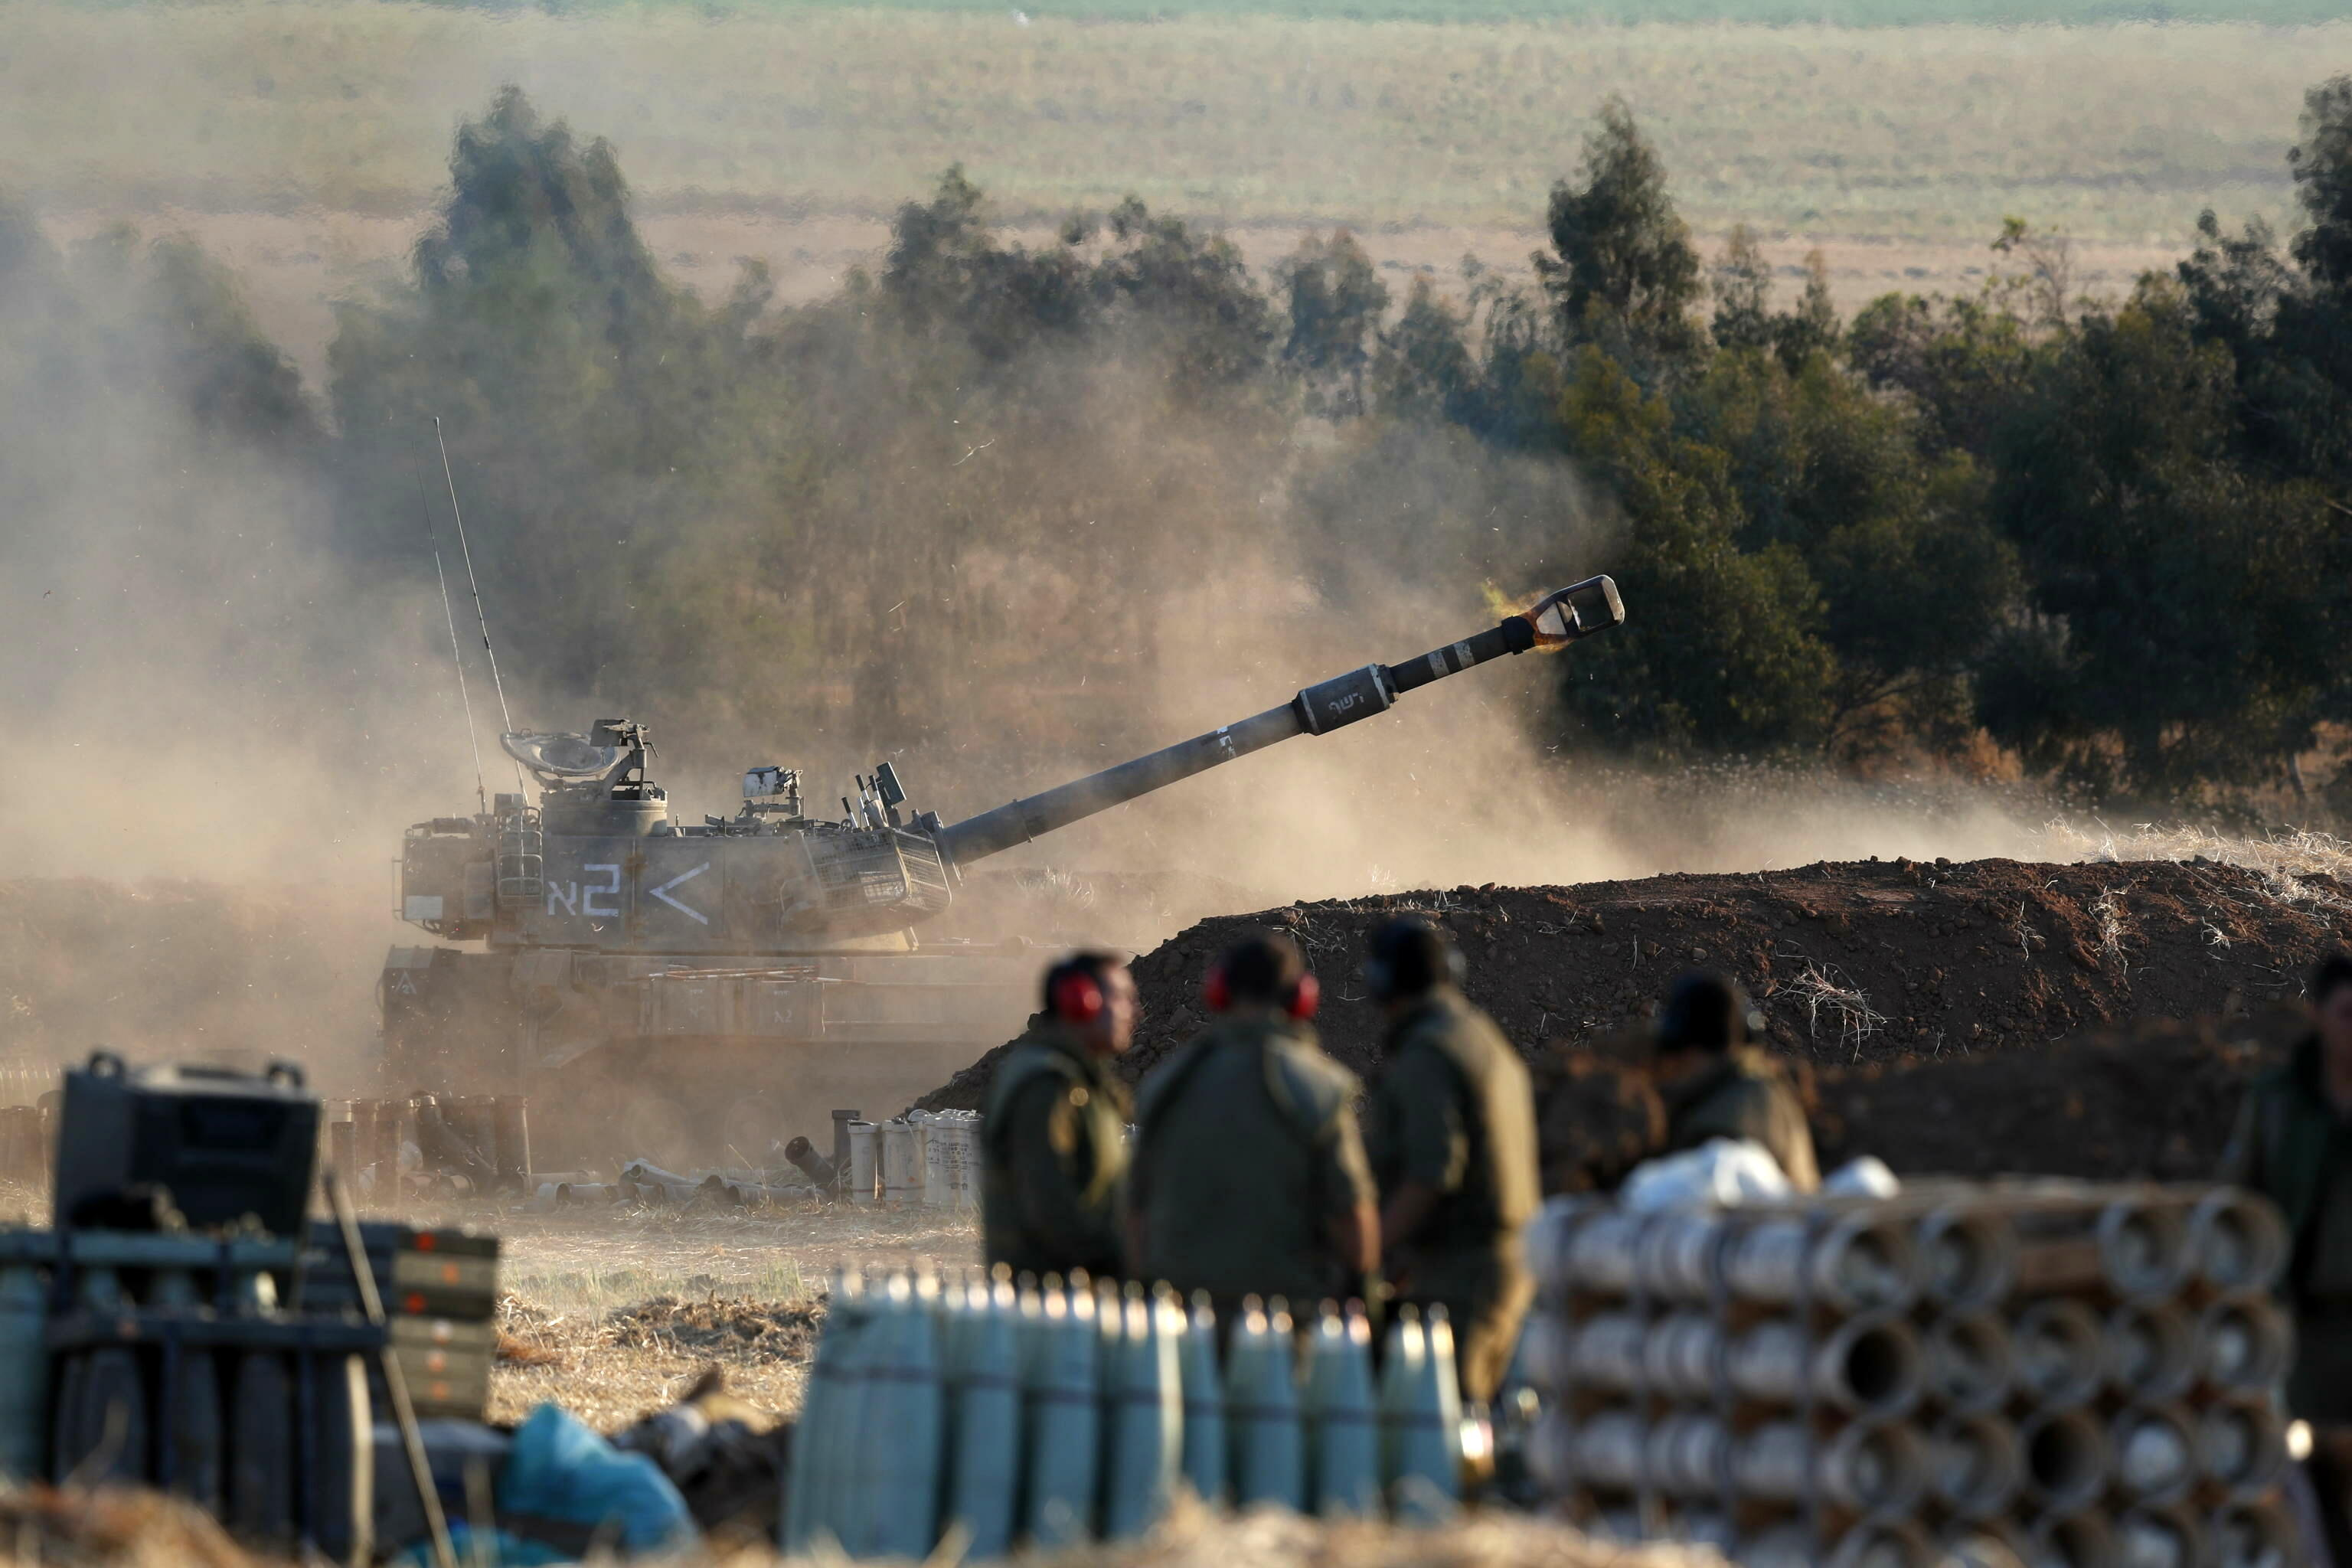 artiglieria israeliana bombarda gaza-2